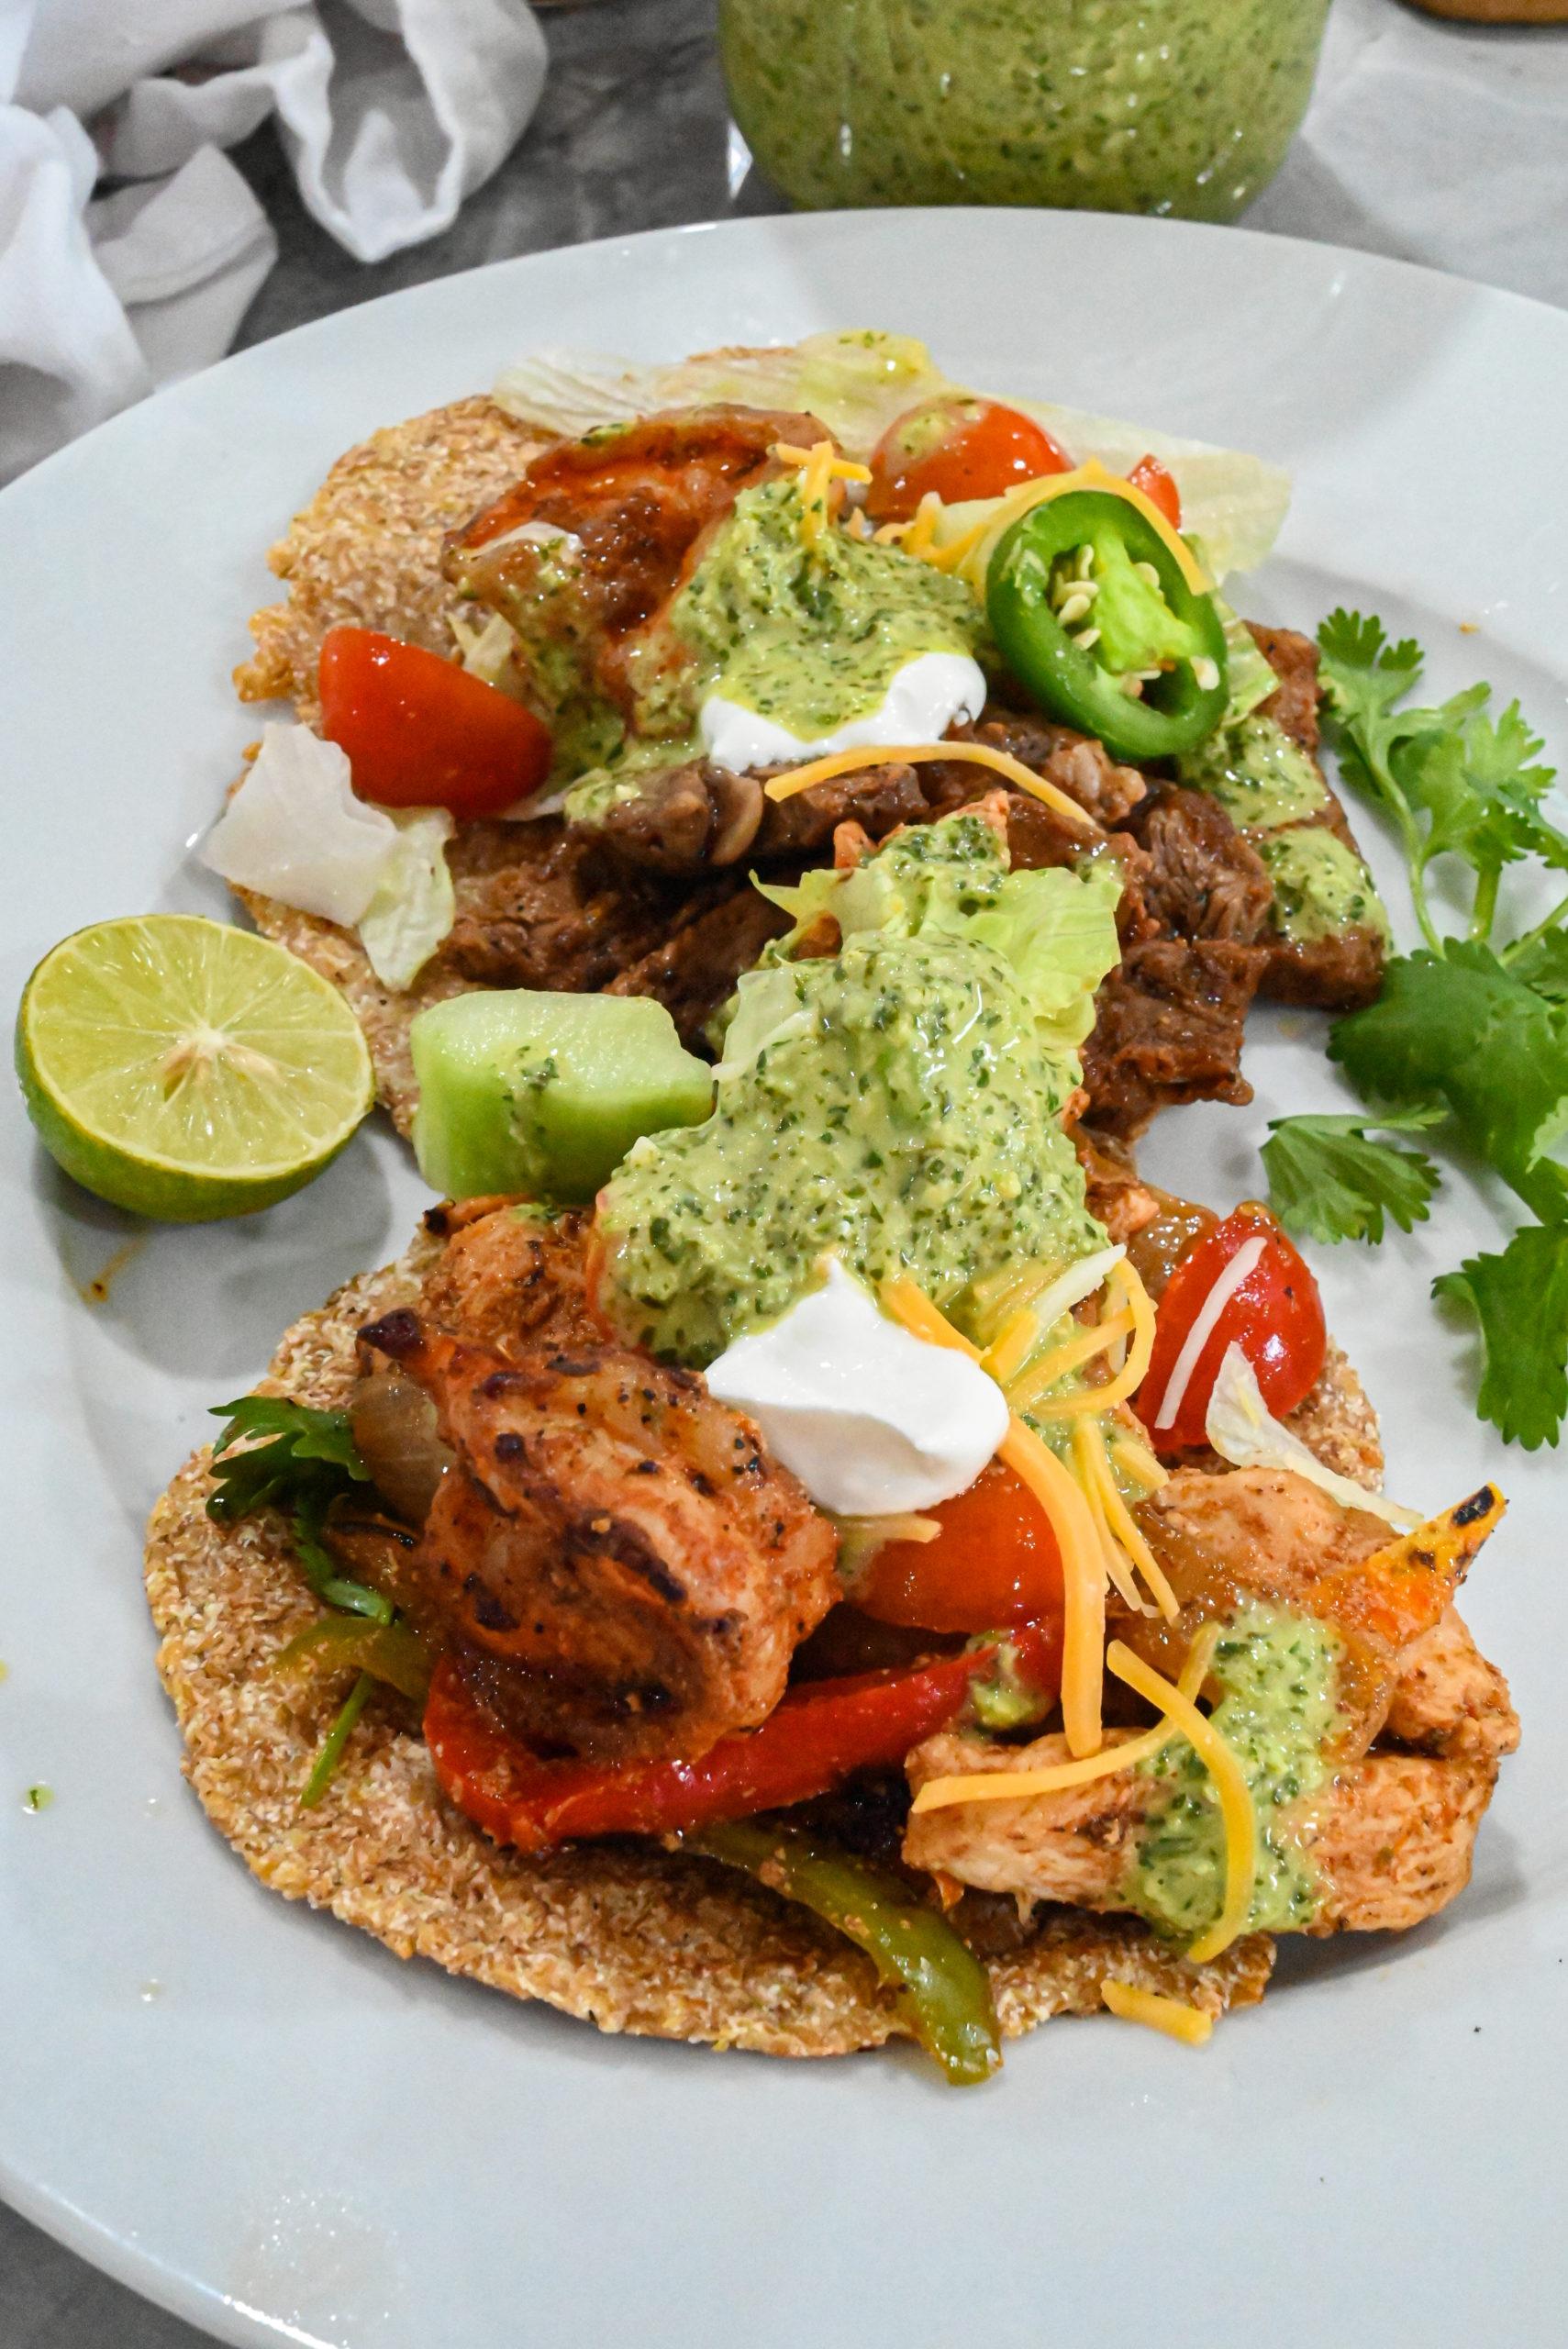 keto tacos with keto spicy cilantro garlic sauce drizzzled on top